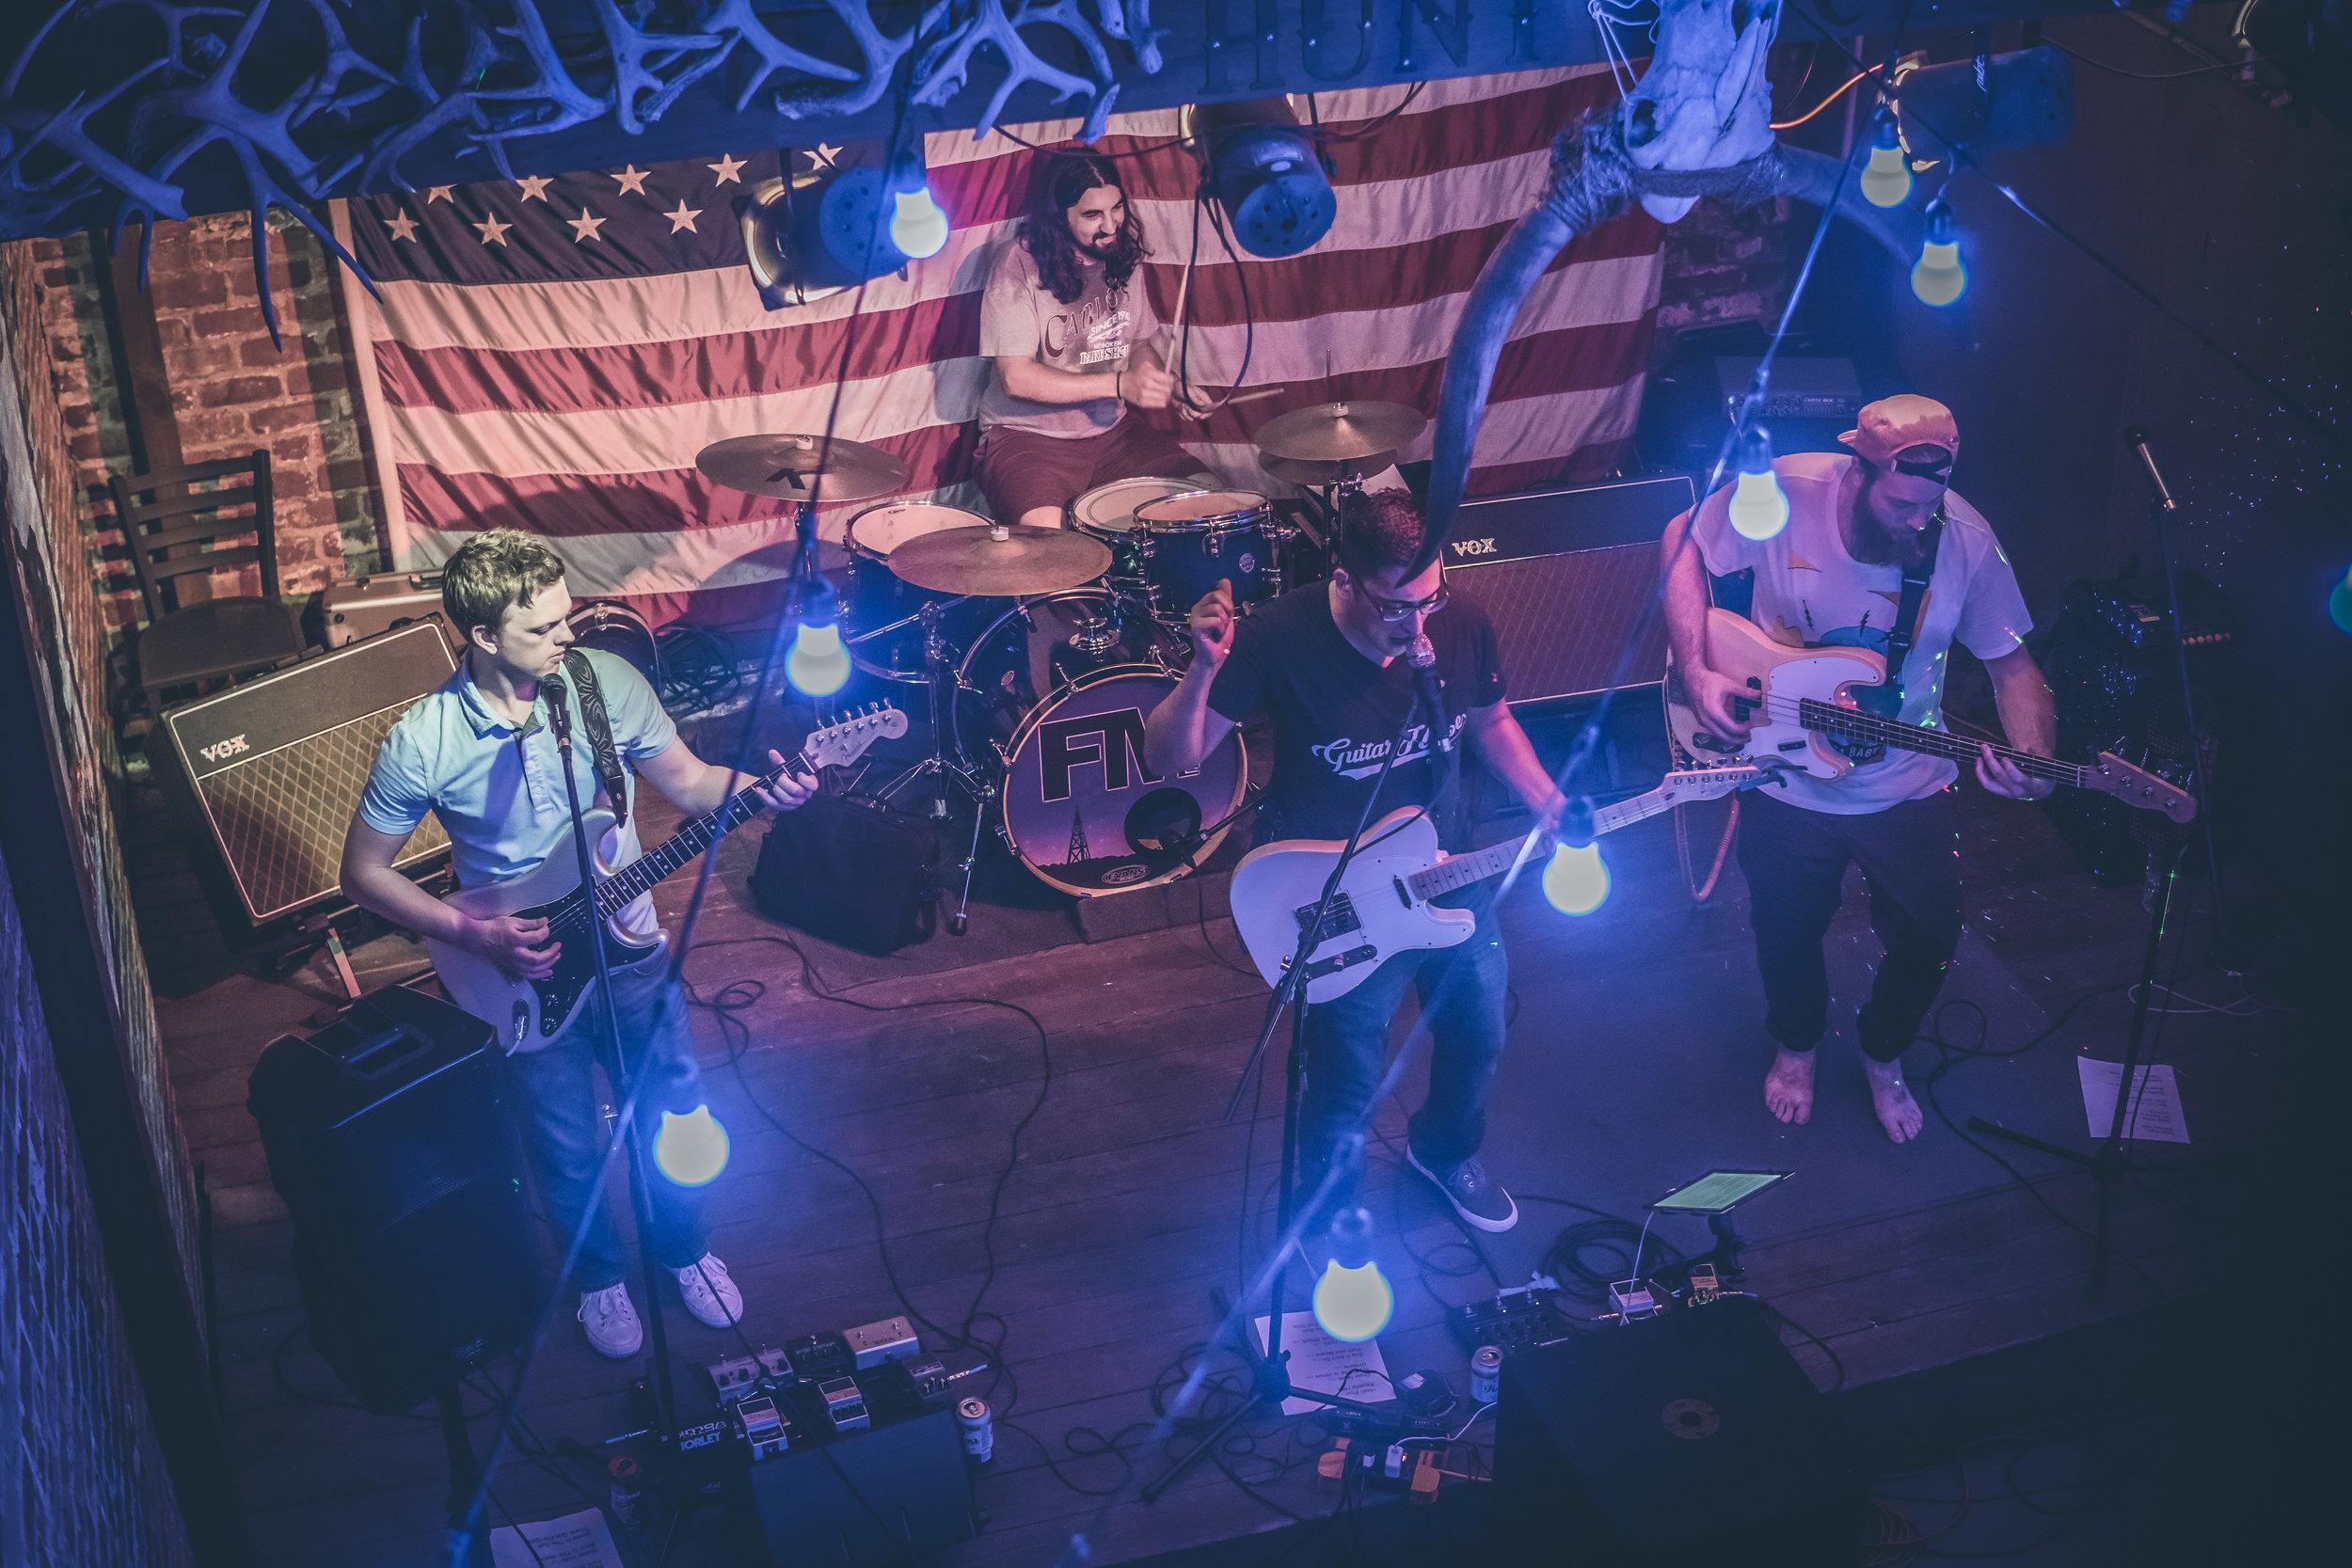 FM Pilots - Tulsa Rock Band - The Hunt Club Tulsa, OK 061016-15.jpg